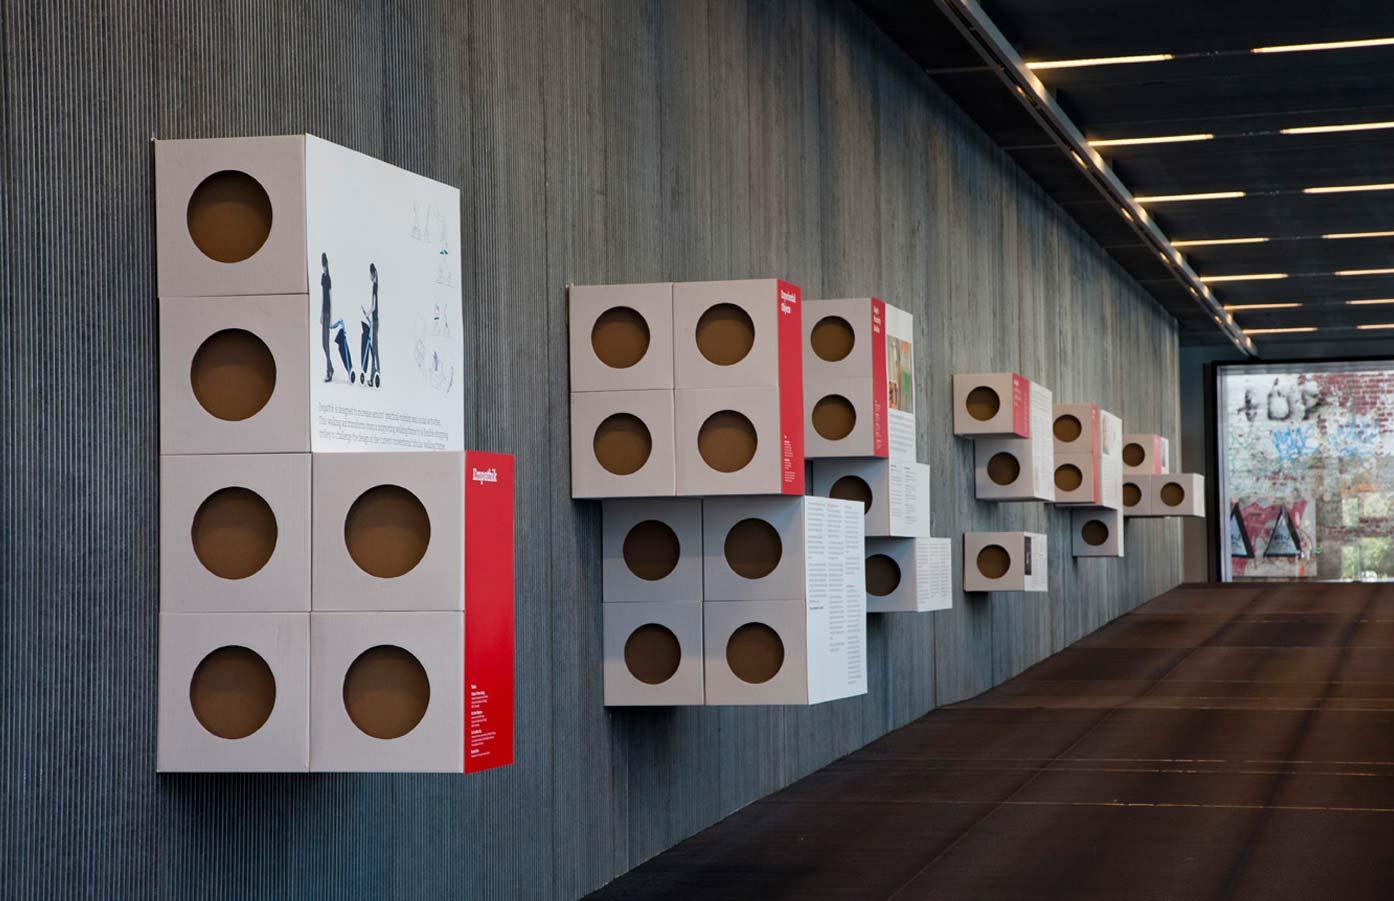 Paper-Tiger-RMIT-DesignChalleng-05.jpg